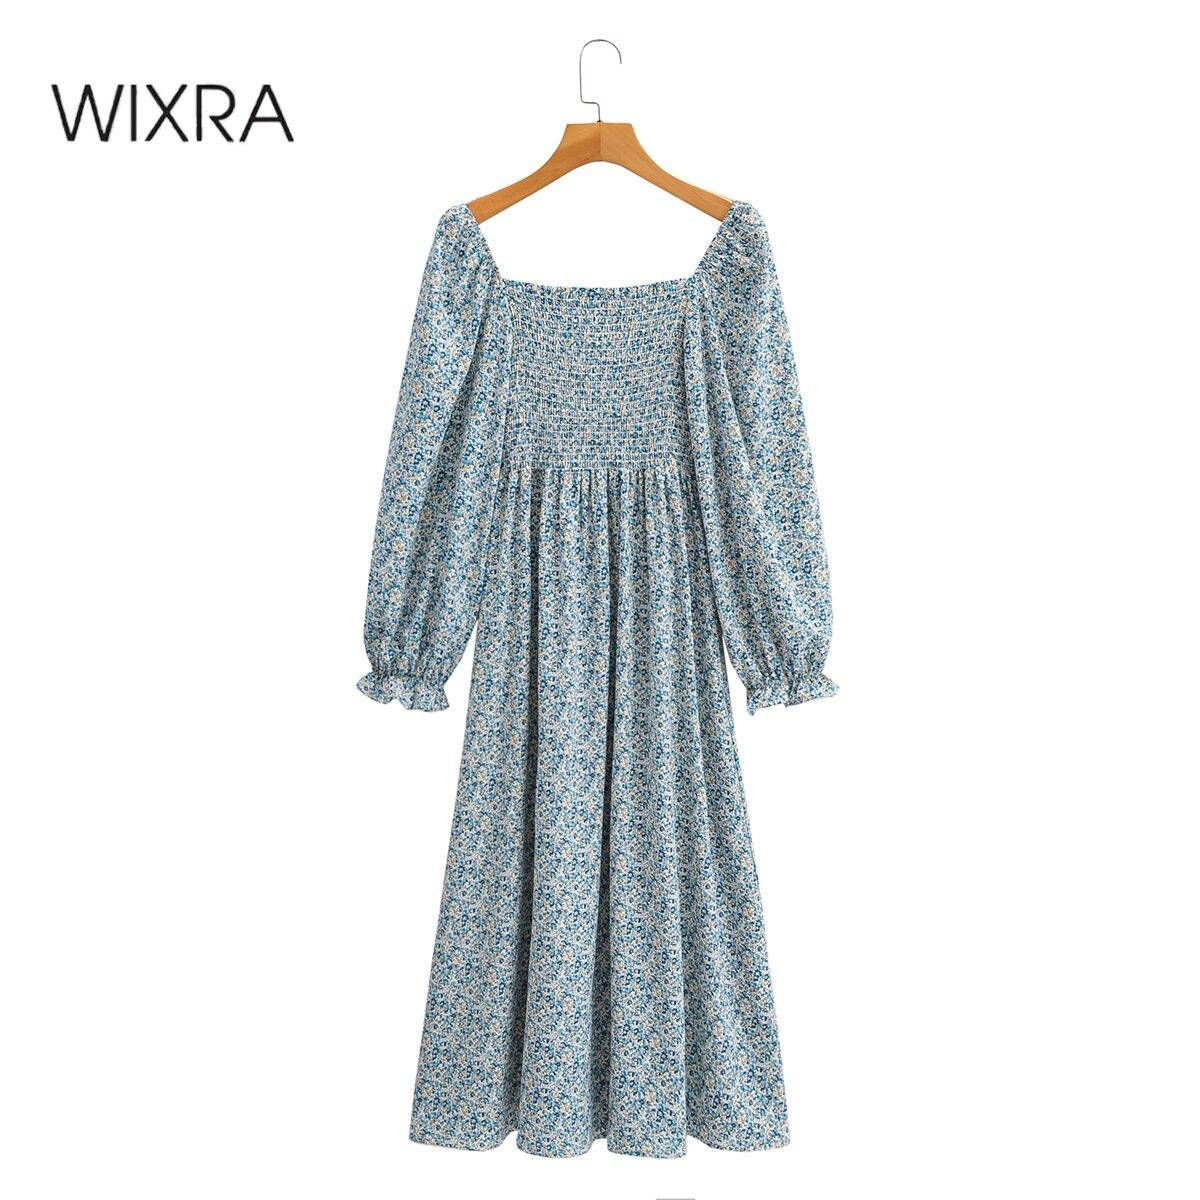 Wixra المرأة فستان طويل الصيف أنيقة ساحة طوق الأزهار طباعة مرونة الخصر كم كامل ألف خط الإناث الملابس